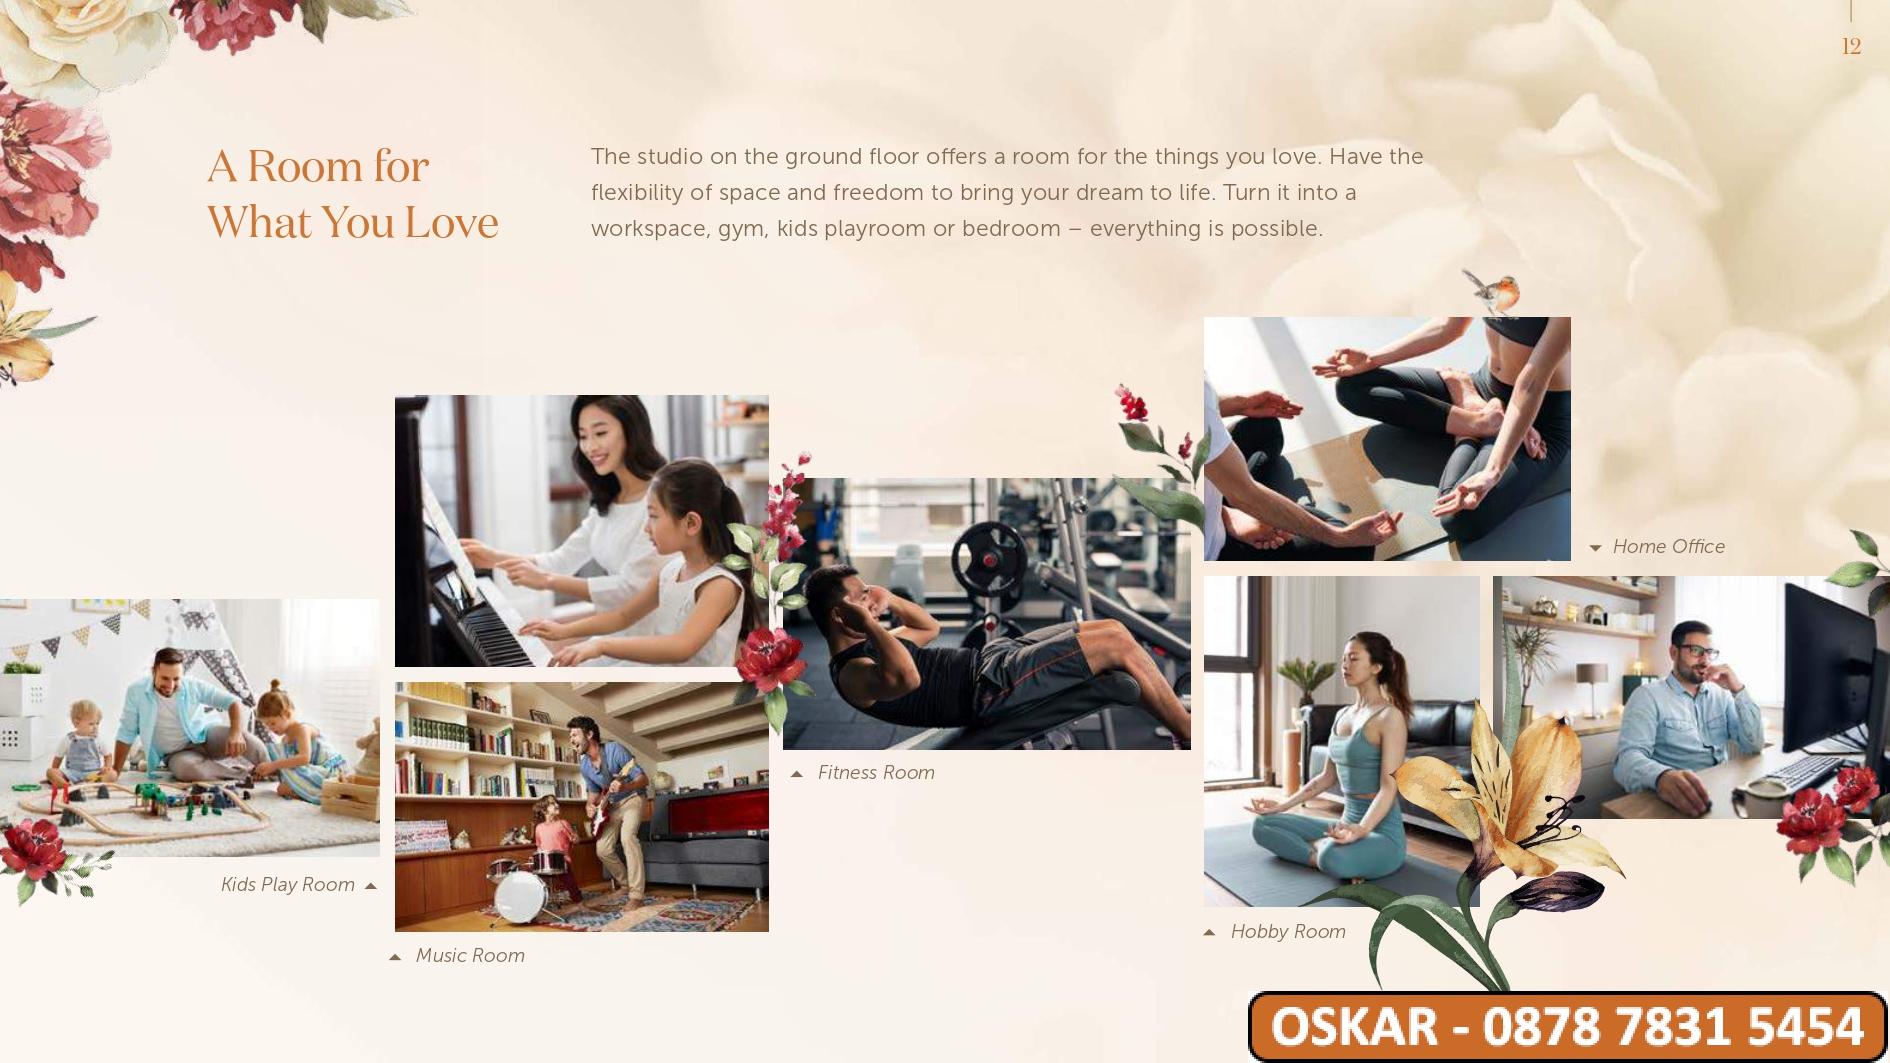 E-Brochure Alam Sutera Winona - Oskar_page-0012